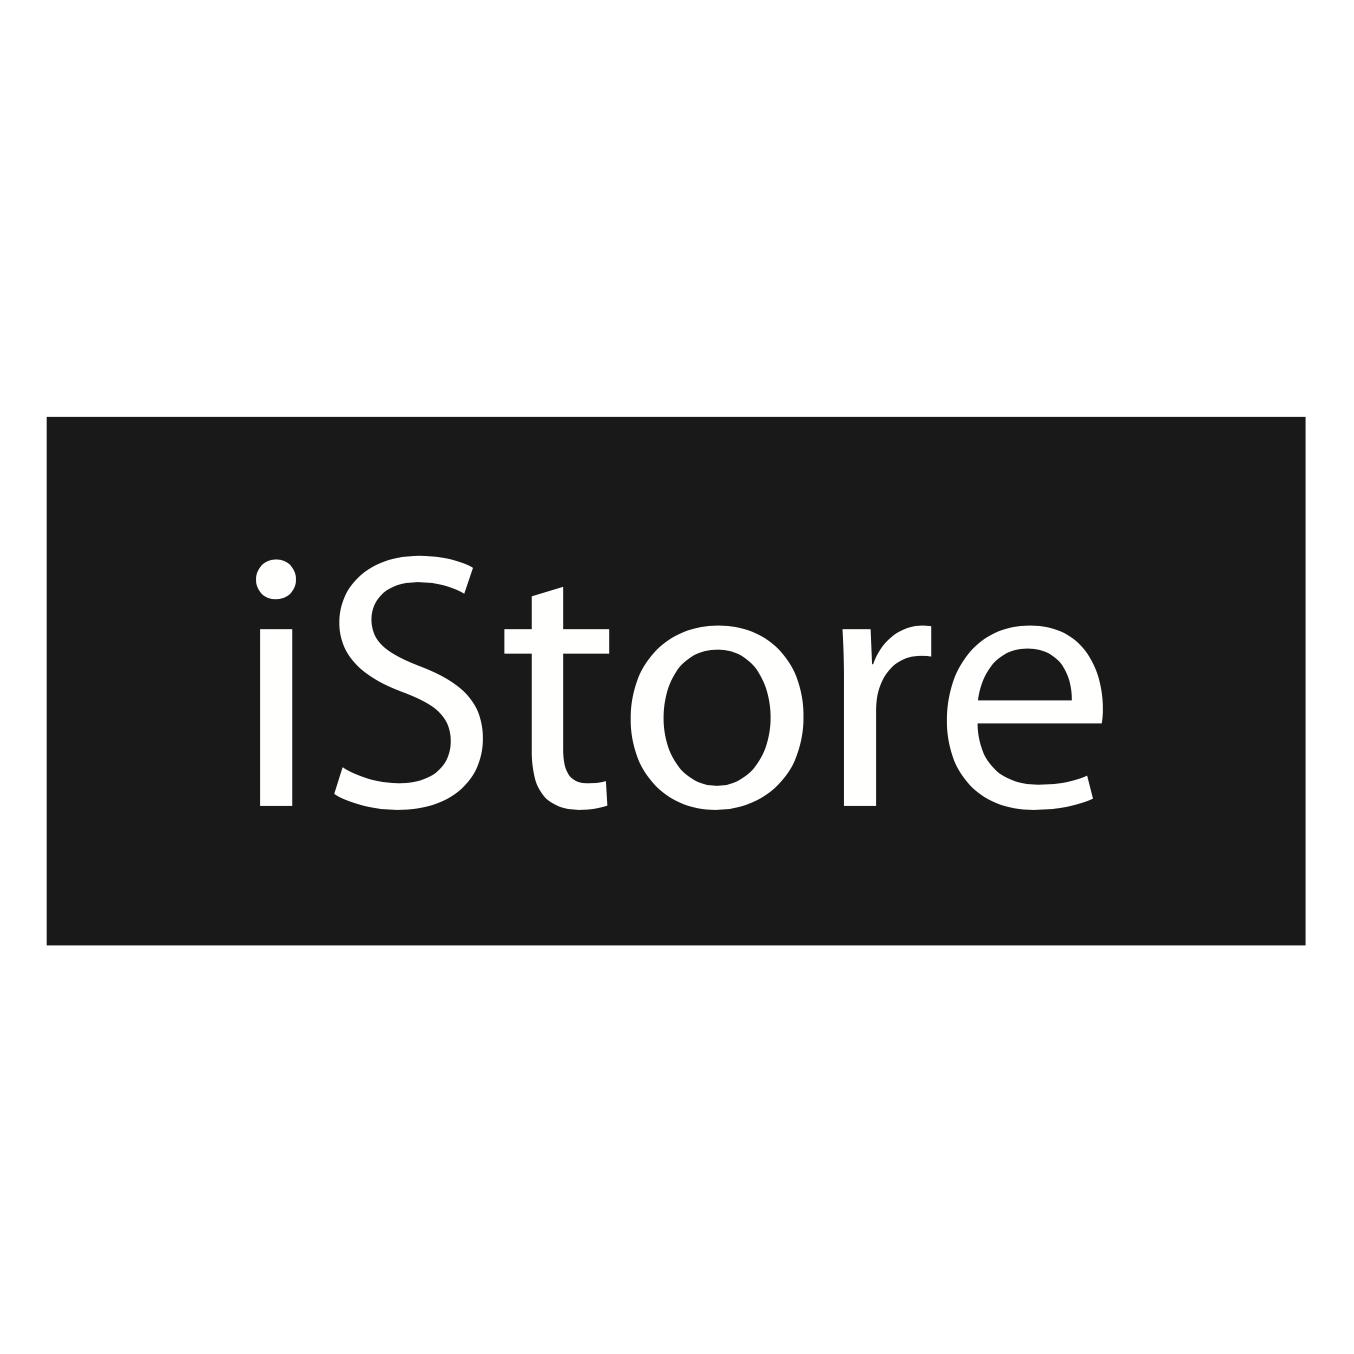 iPhone 12 mini 64GB - Black